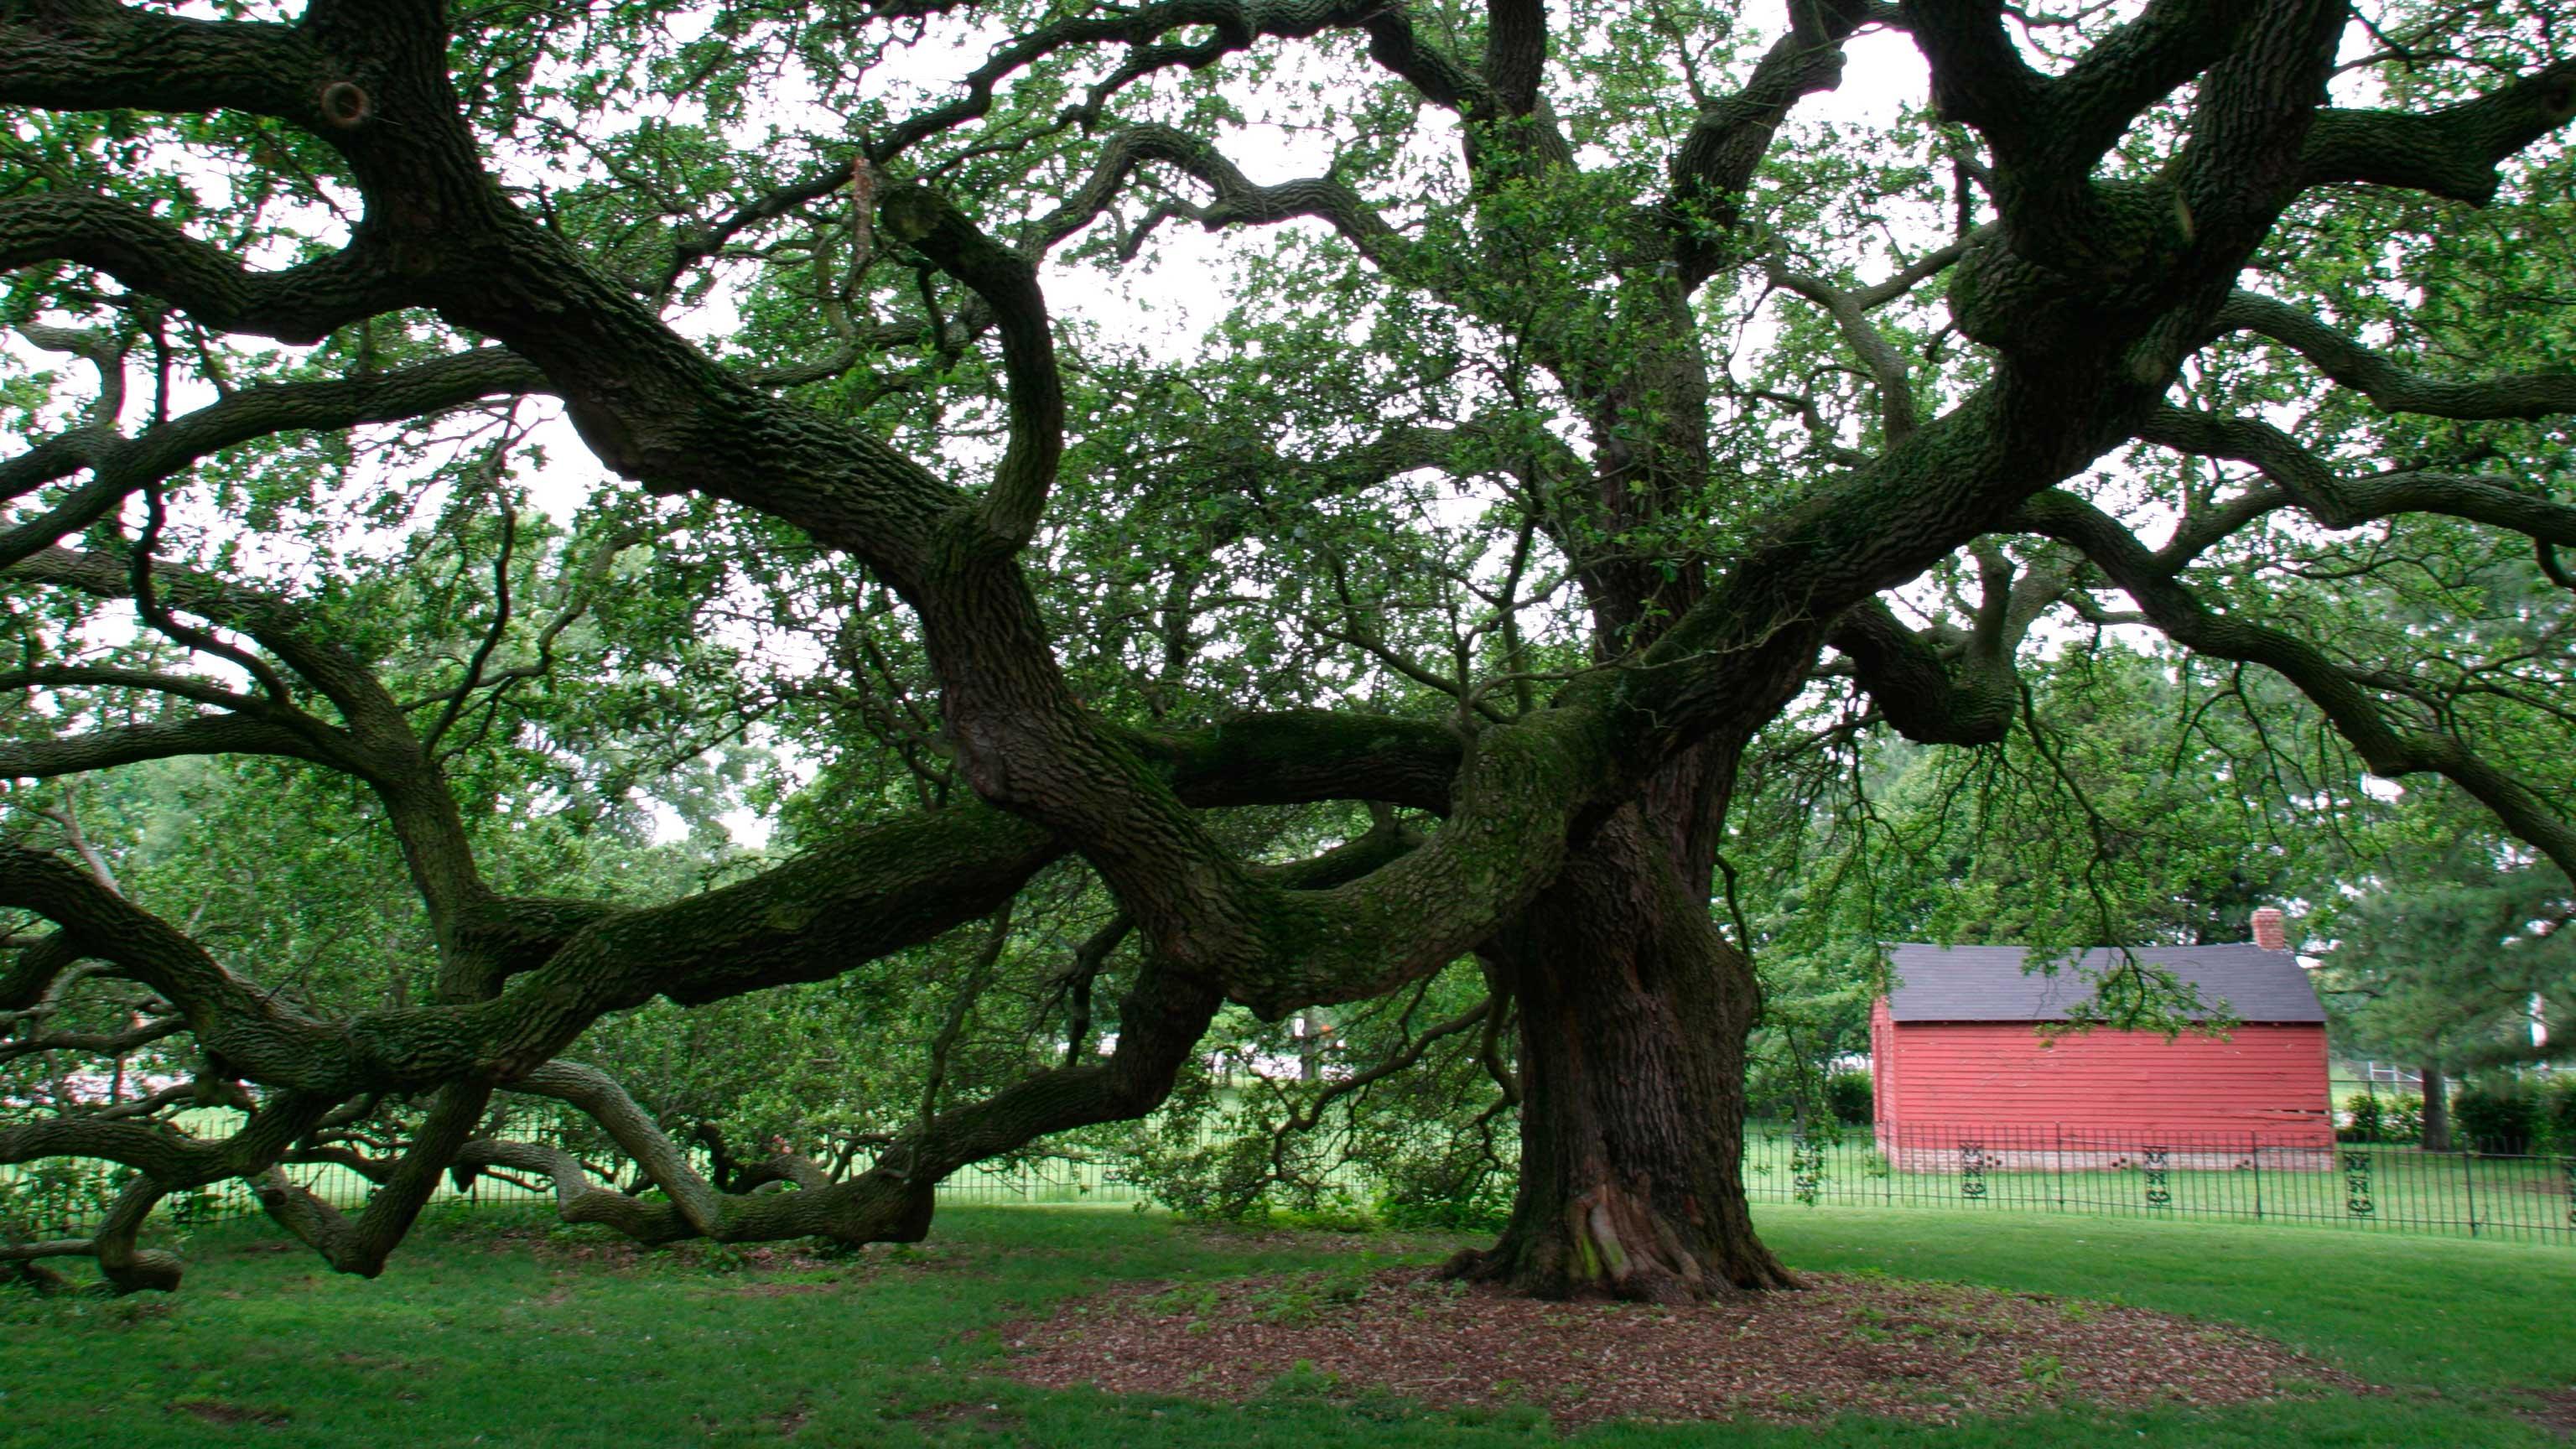 The Emancipation Oak on the campus of Hampton University.